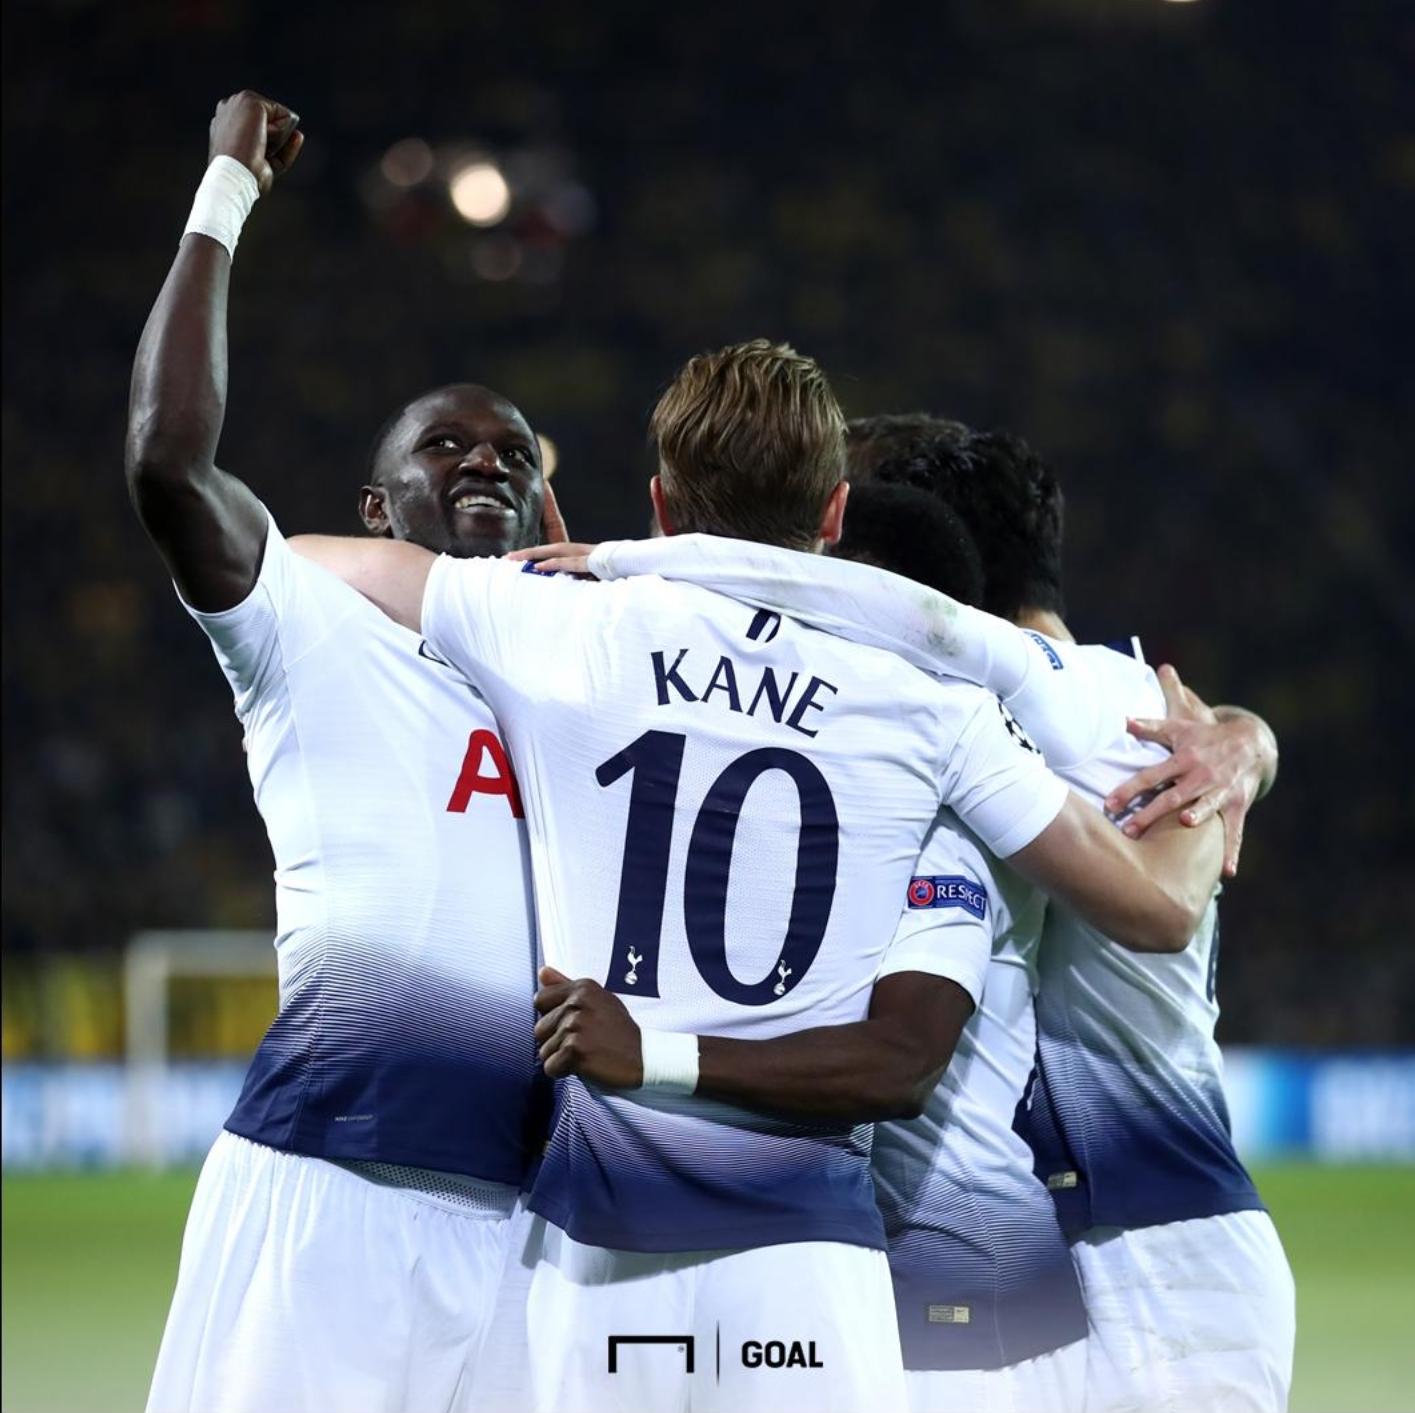 Match Report: Borussia Dortmund 0 – 1 Tottenham (0-4 agg)